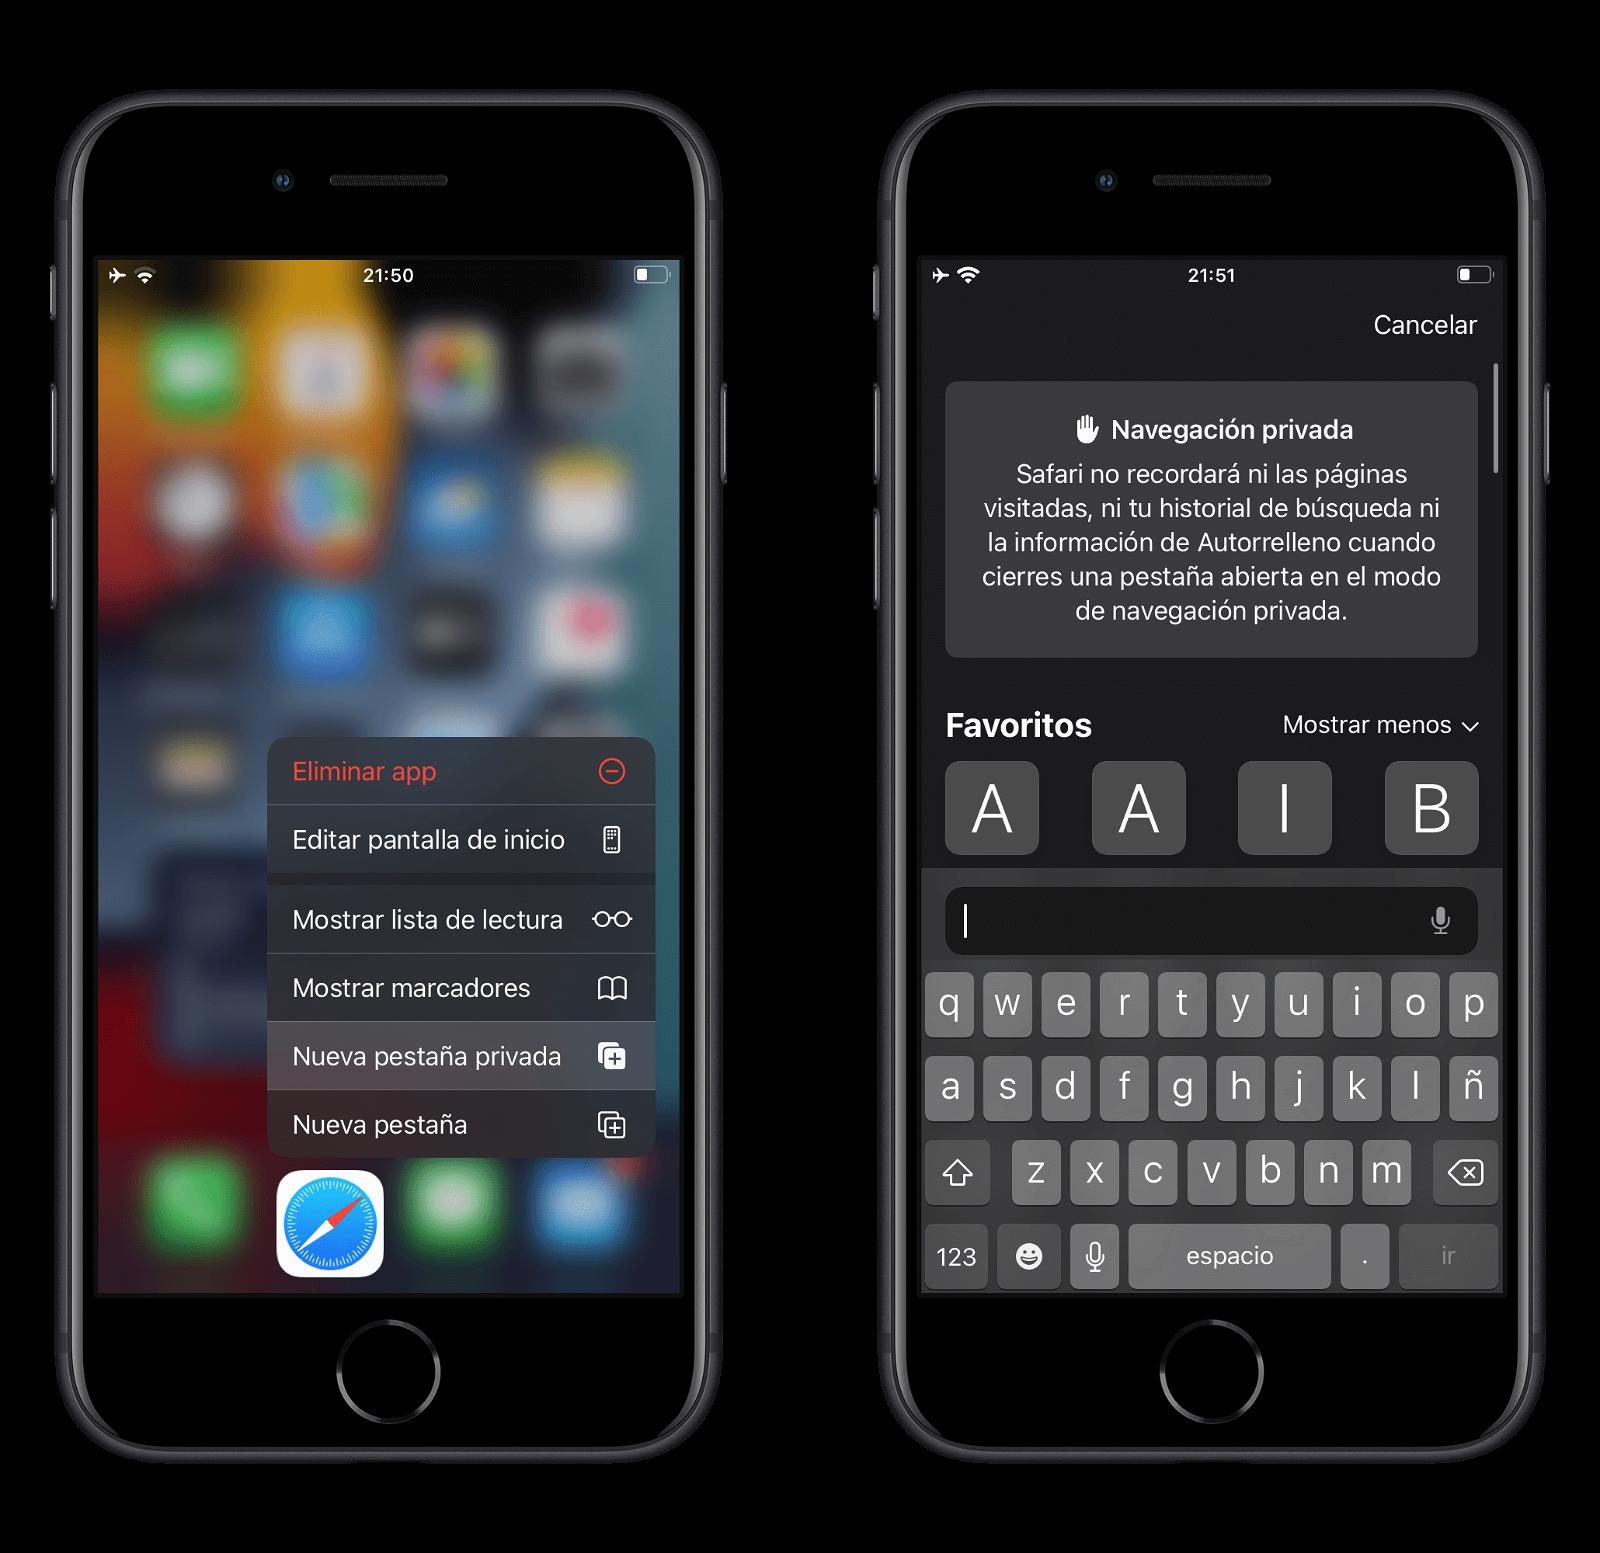 Abrir pestaña privada en Safari desde la pantalla de inicio